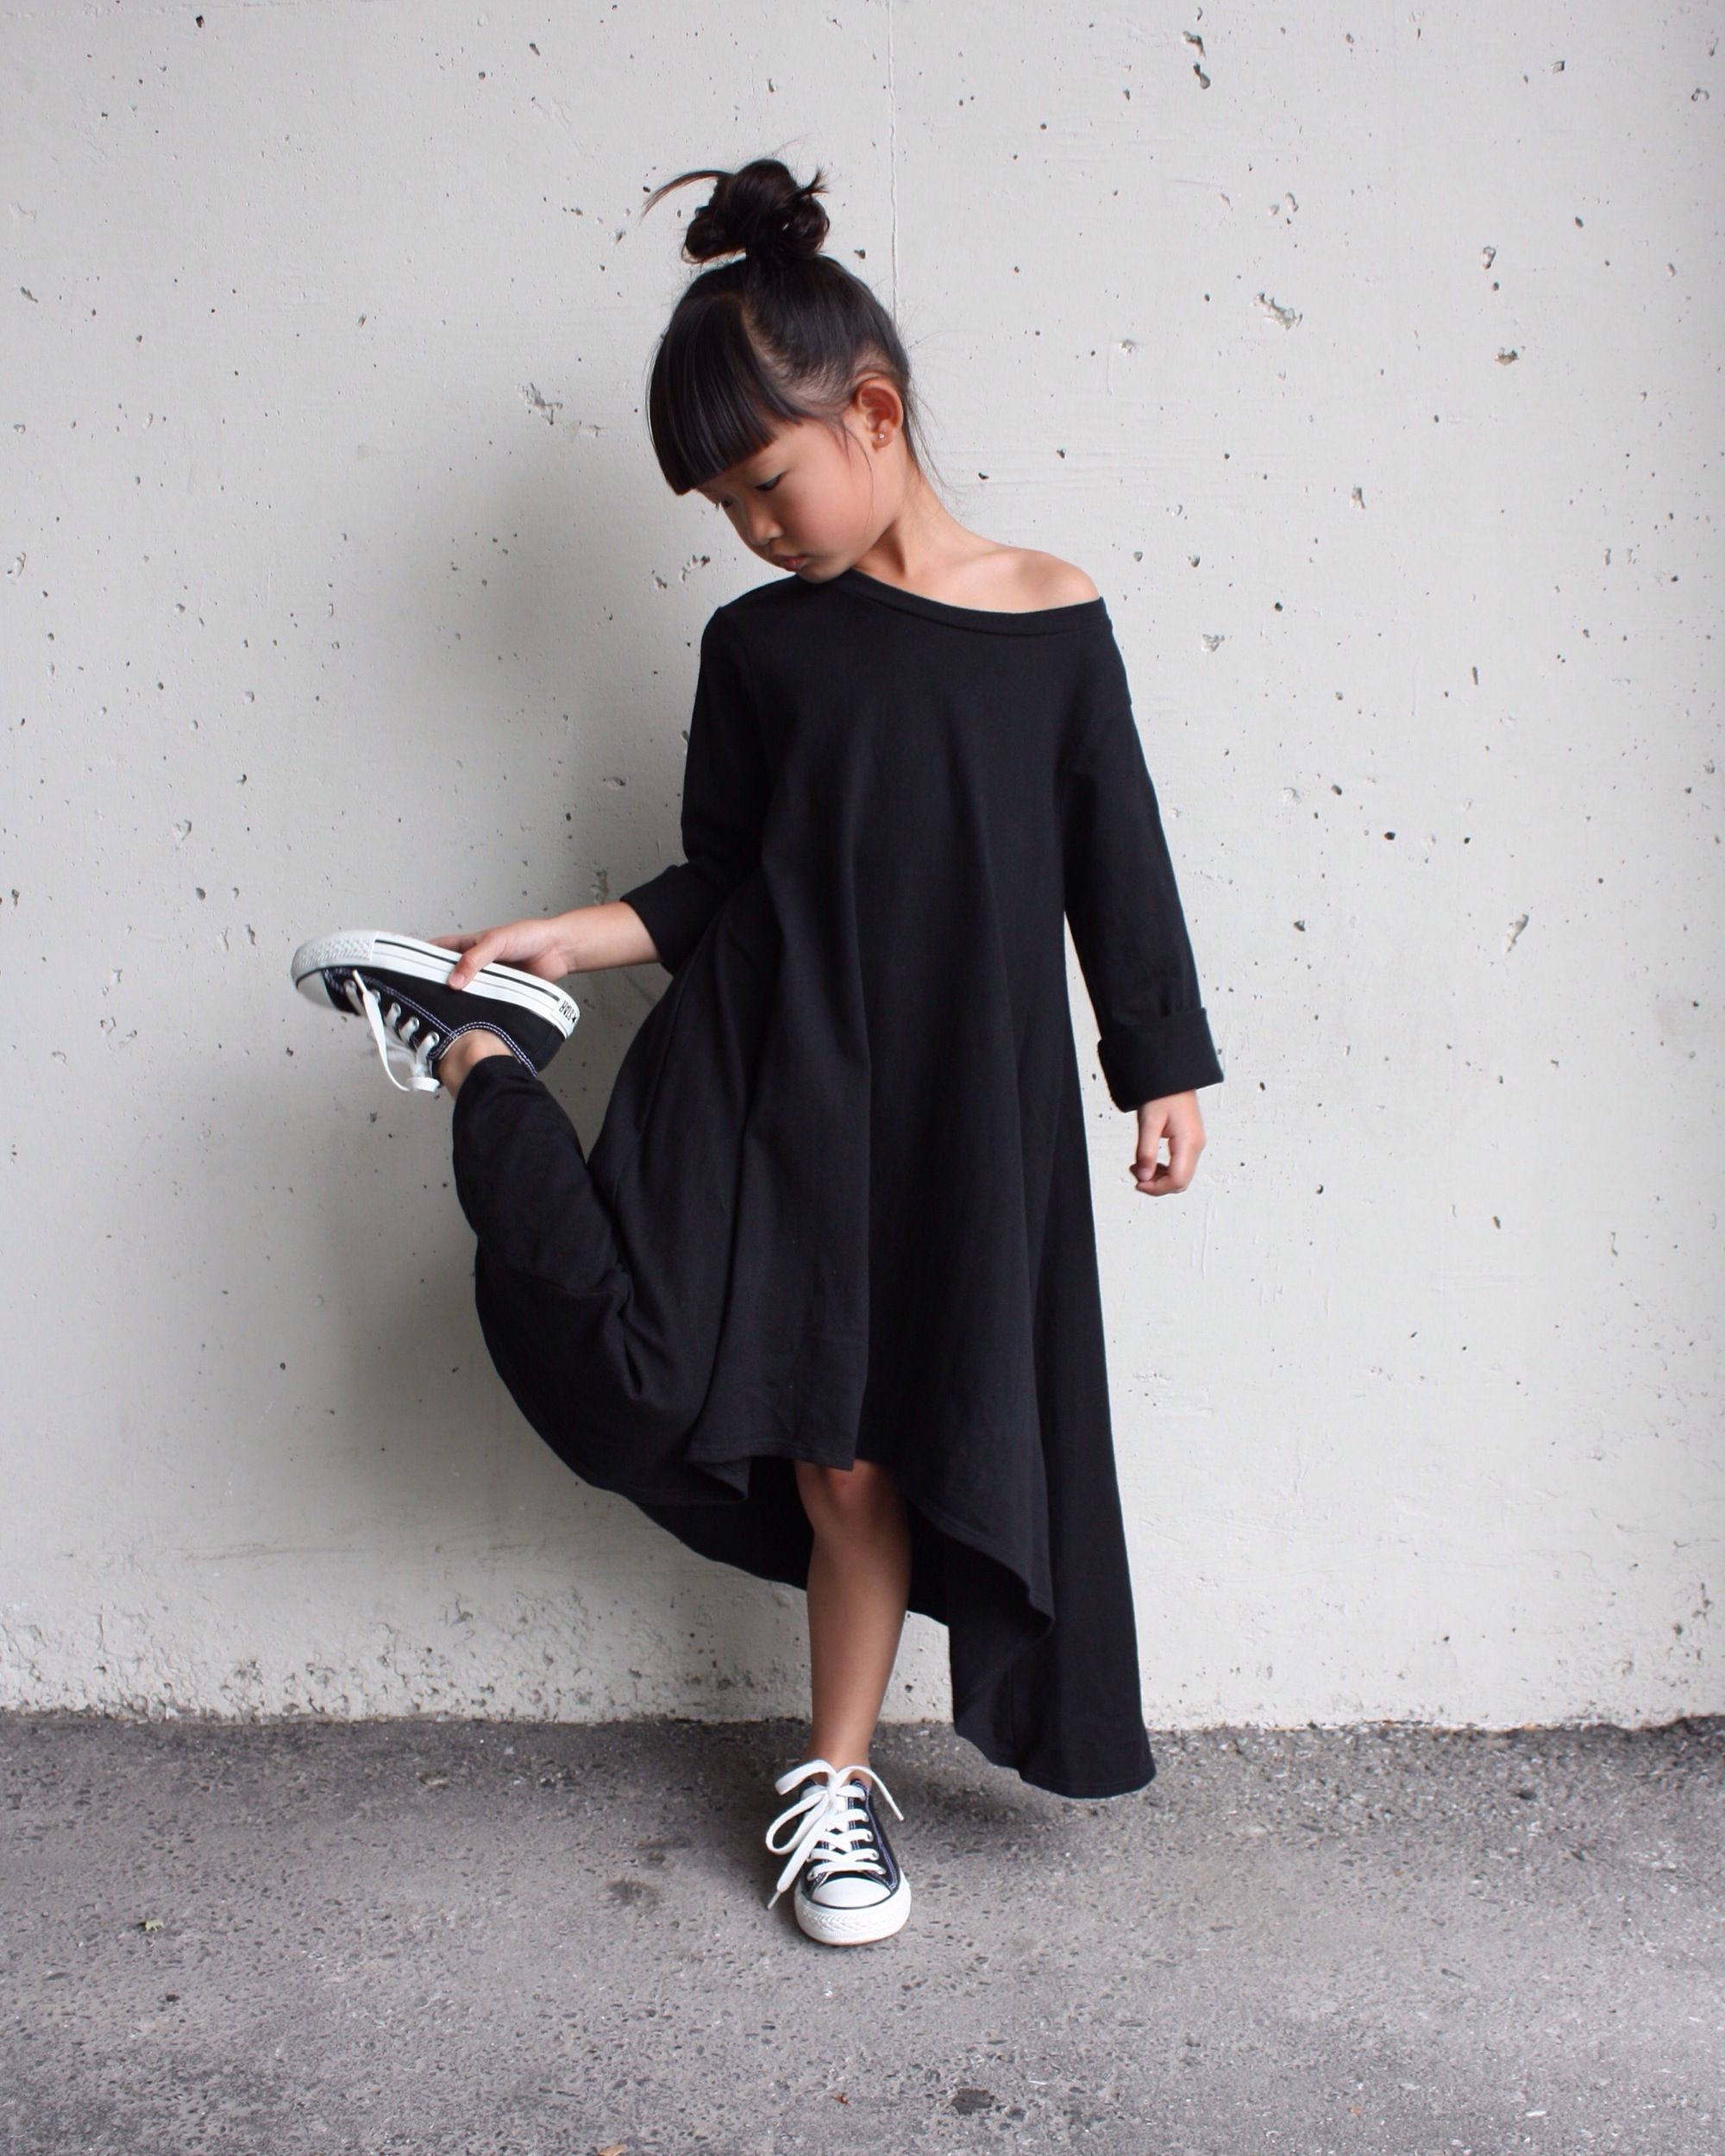 Whitefilly black filly dress pakaian anak pinterest black